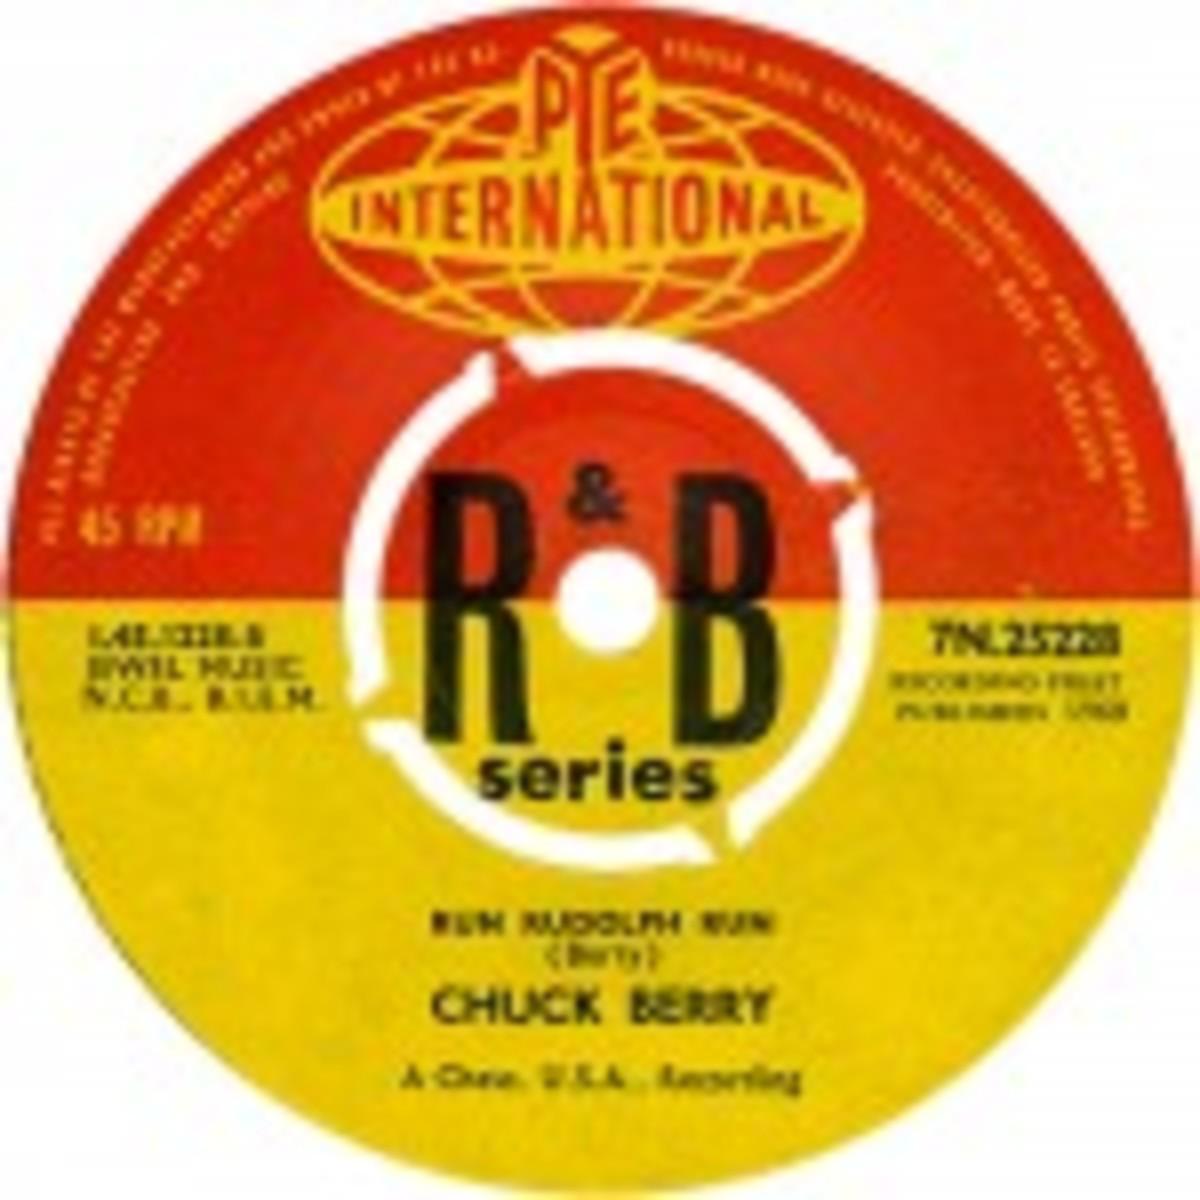 Chuck Berry Run Rudolph Run